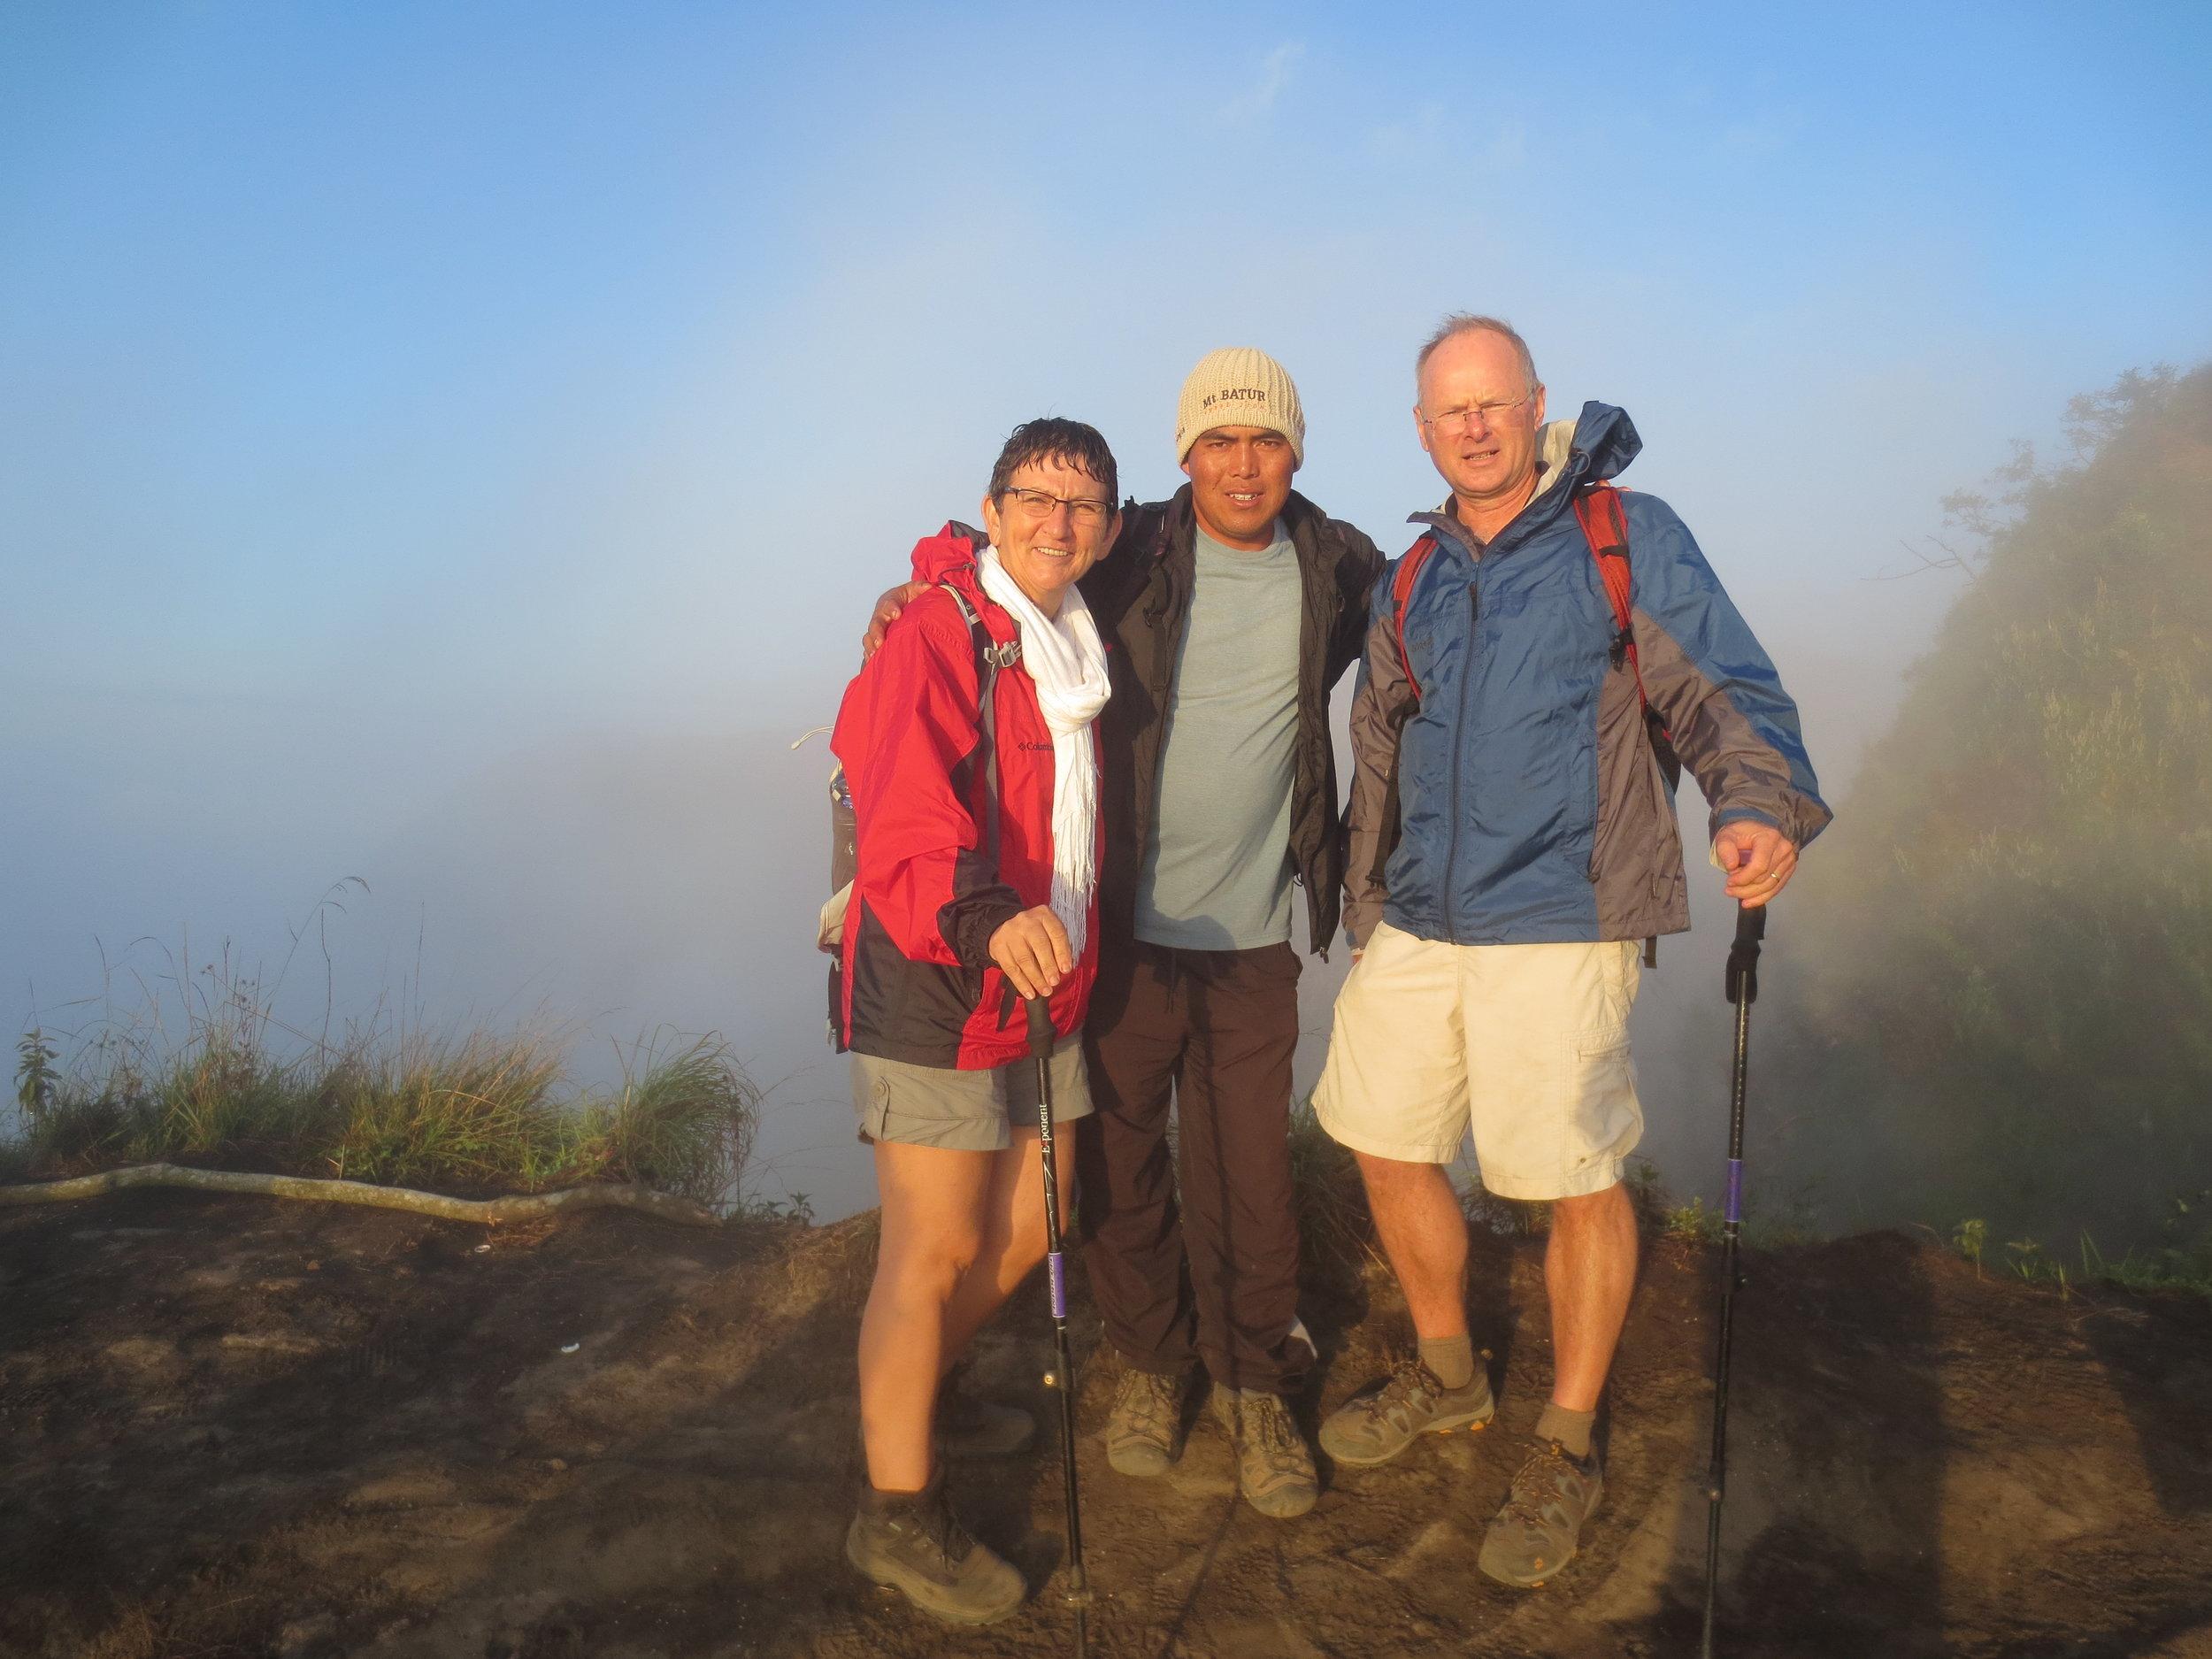 On top of Gunung Batur, 1700 Mtr.